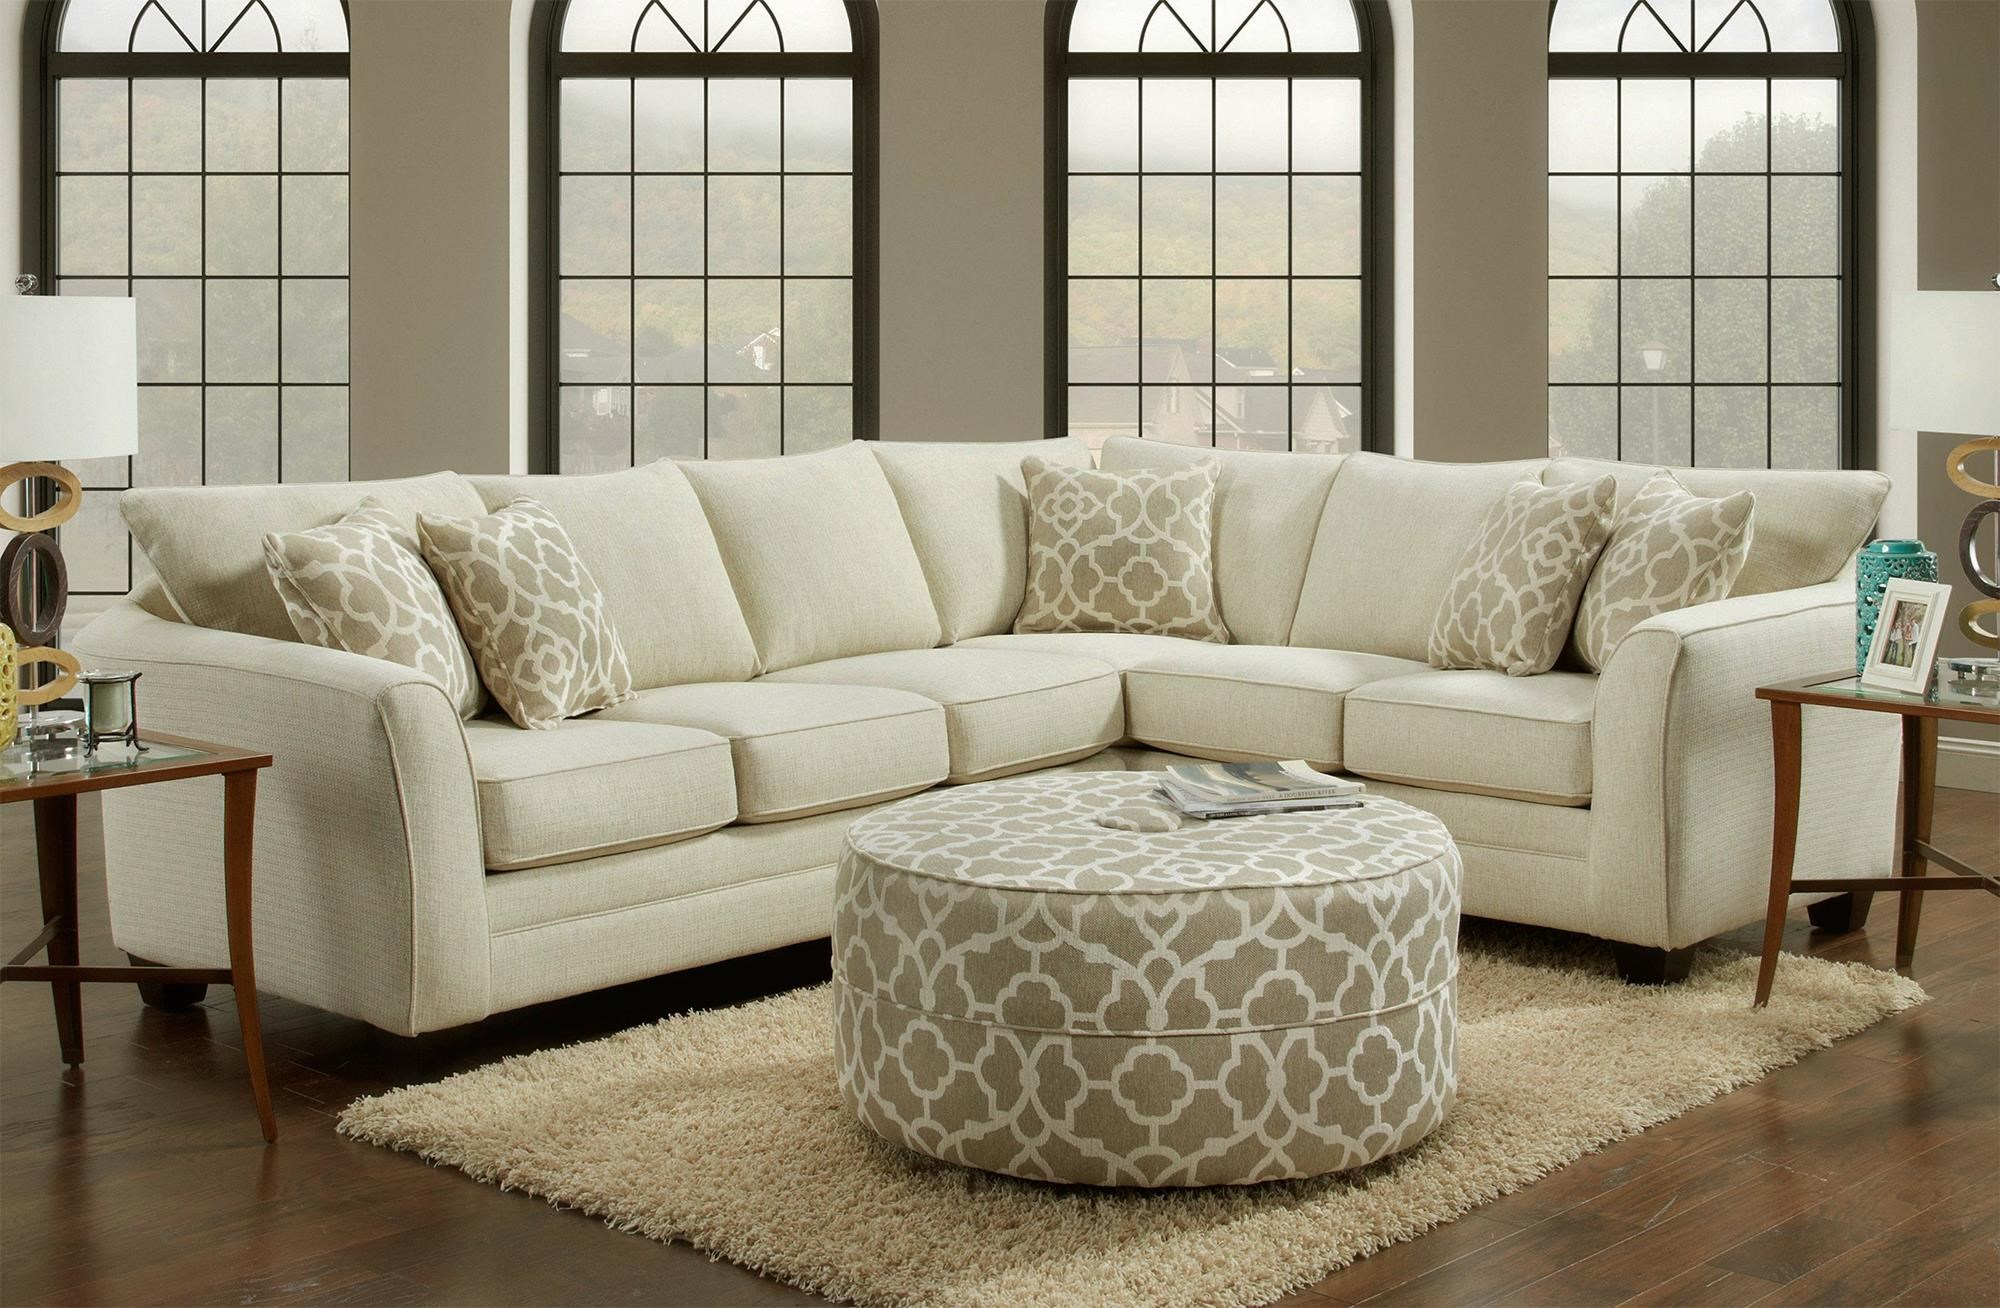 Big Ben 2PC Sectional Sofa at Rotmans